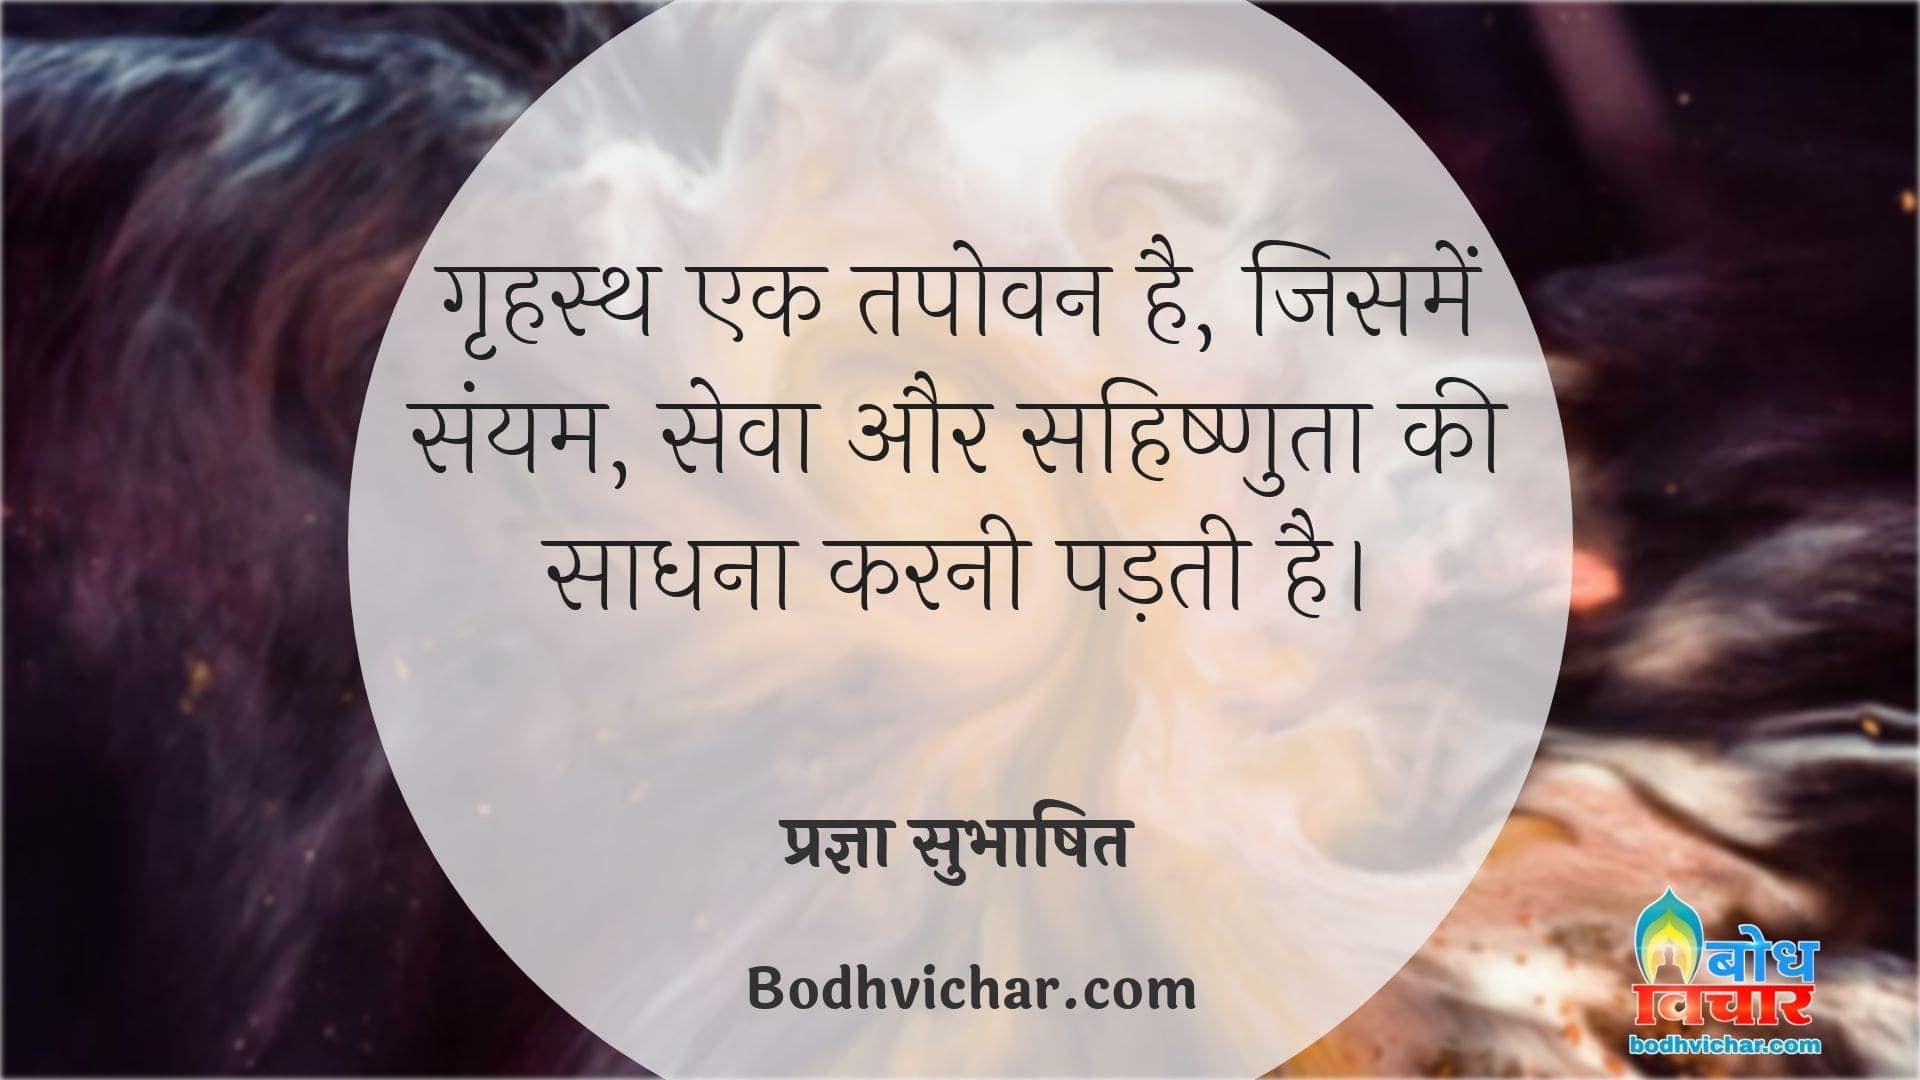 गृहस्थ एक तपोवन है, जिसमें संयम, सेवा और सहिष्णुता की साधना करनी पड़ती है। : Grihastha ek tapovan hai jisme samyam, seva aur sahishnuta ki sadhna karni padti hai. - प्रज्ञा सुभाषित